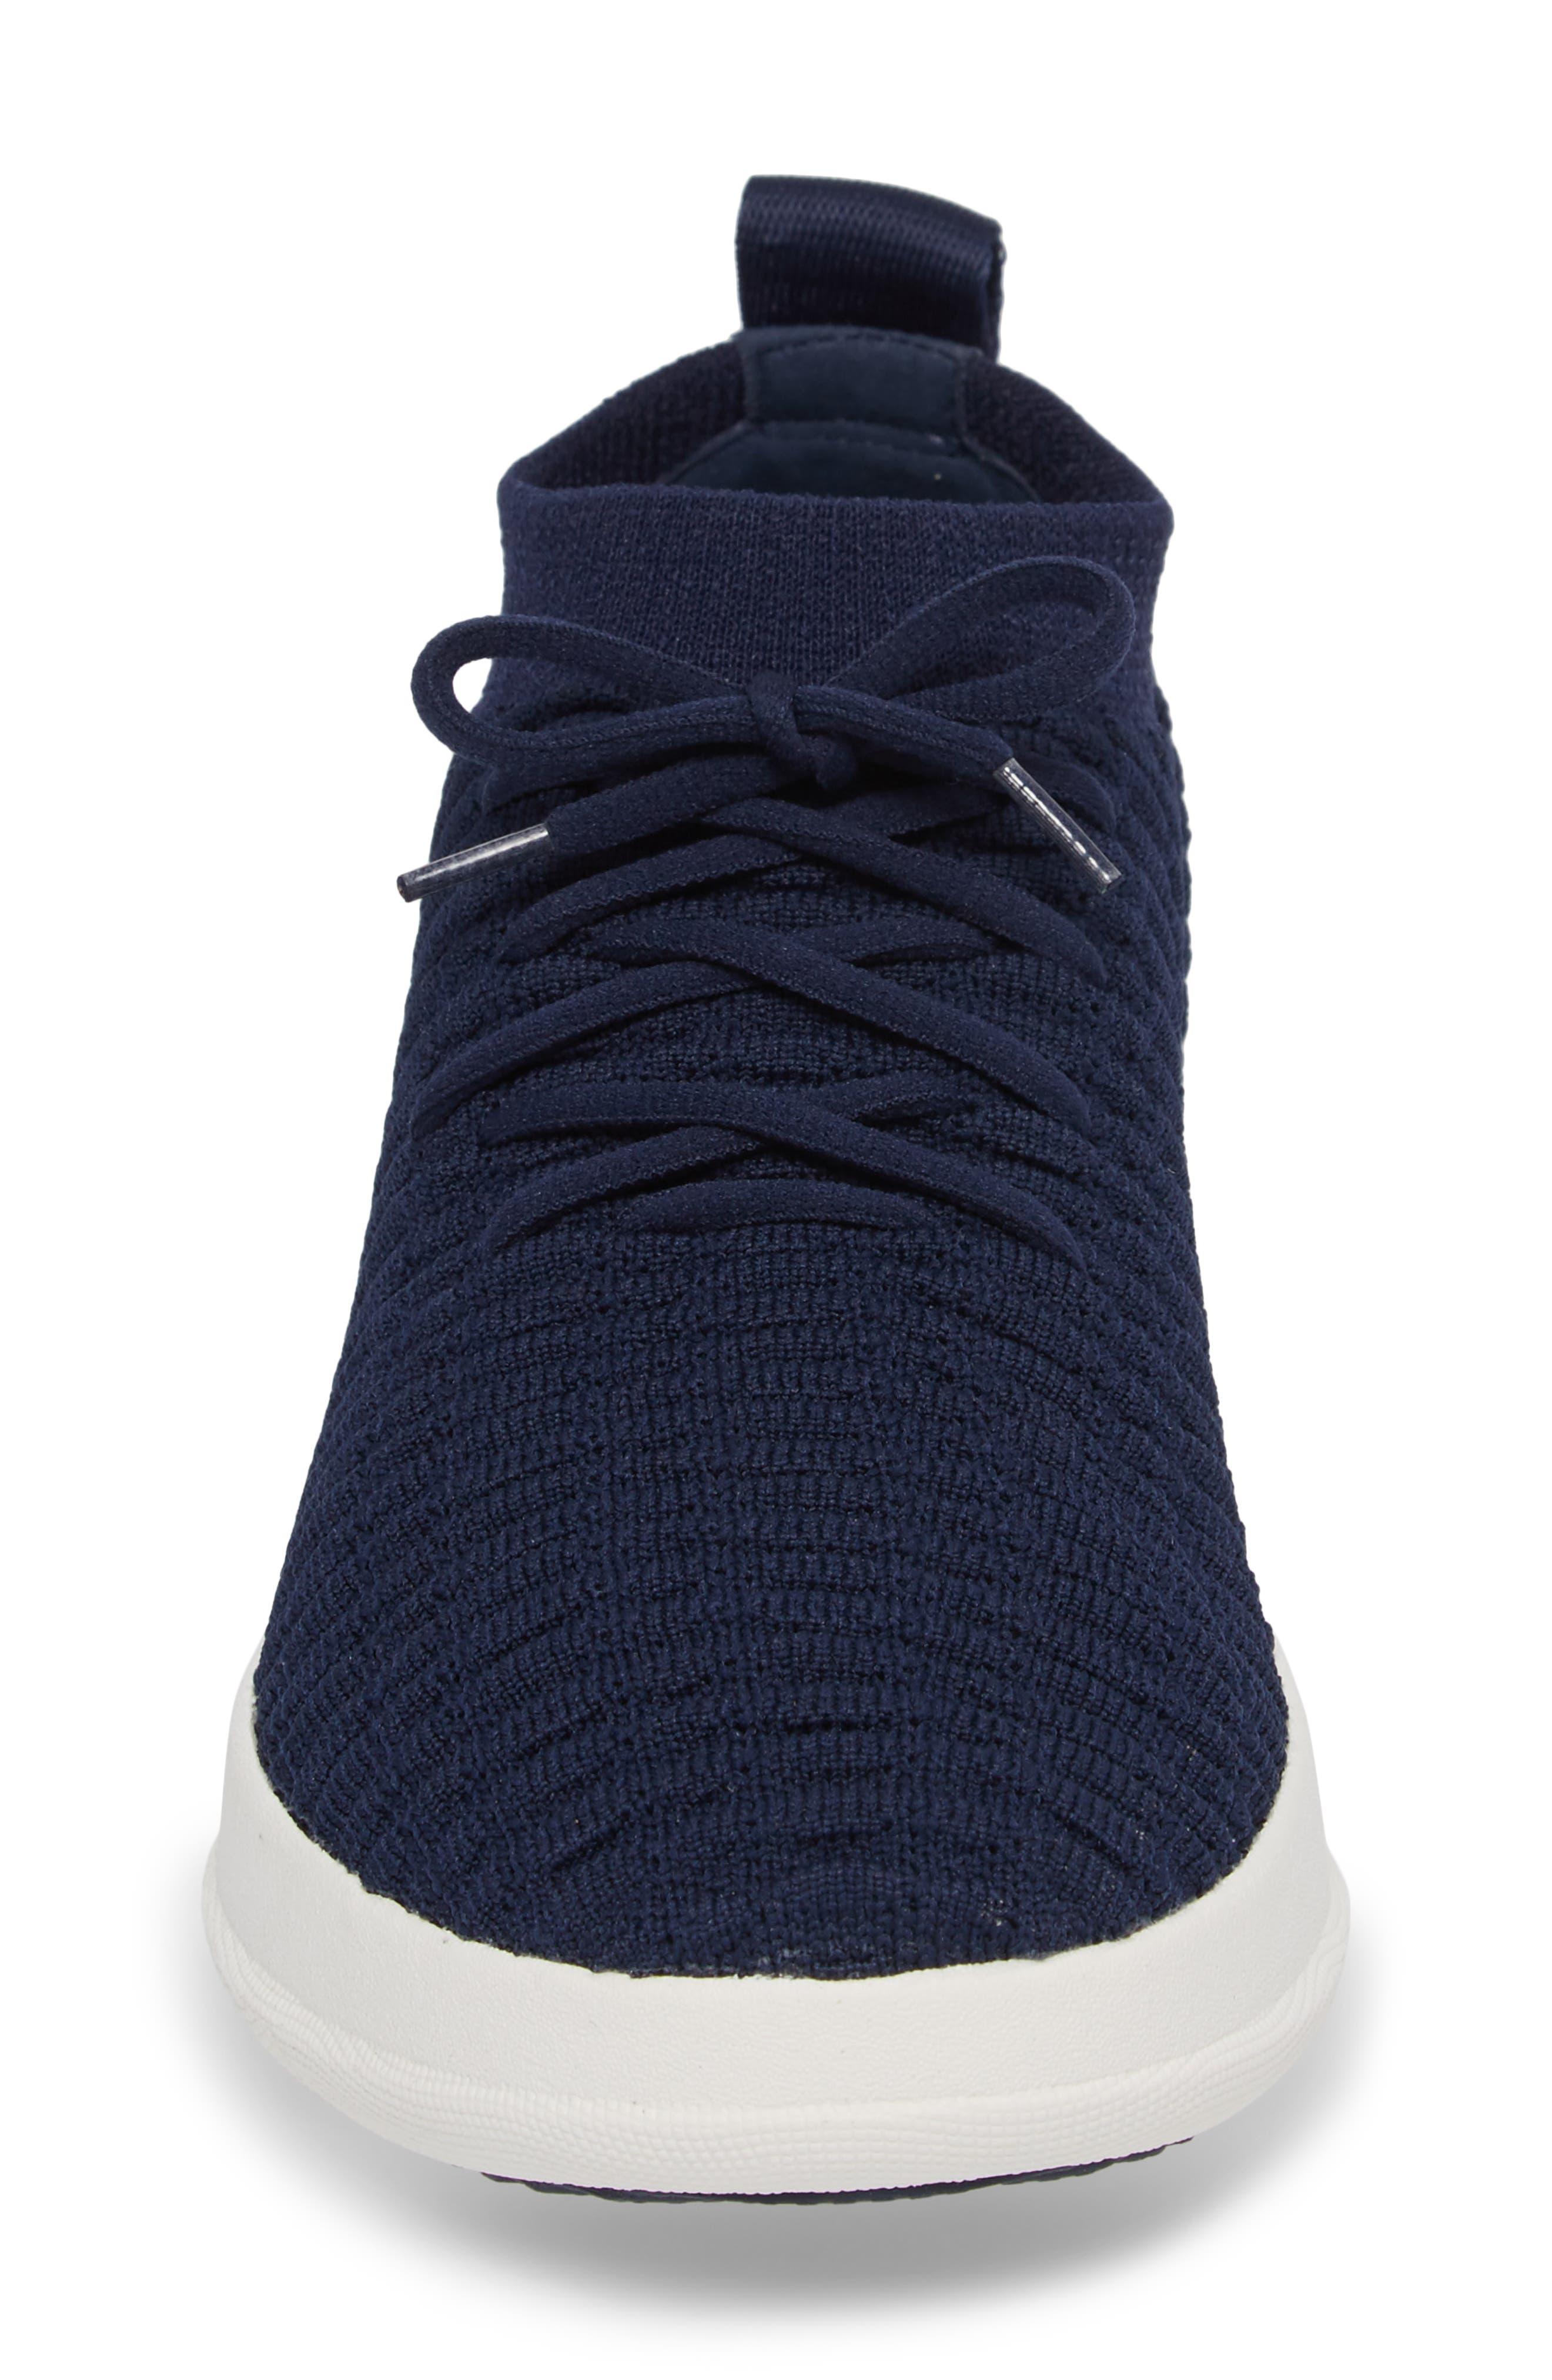 Uberknit<sup>™</sup> Slip-On High Top Sneaker,                             Alternate thumbnail 5, color,                             Midnight Navy